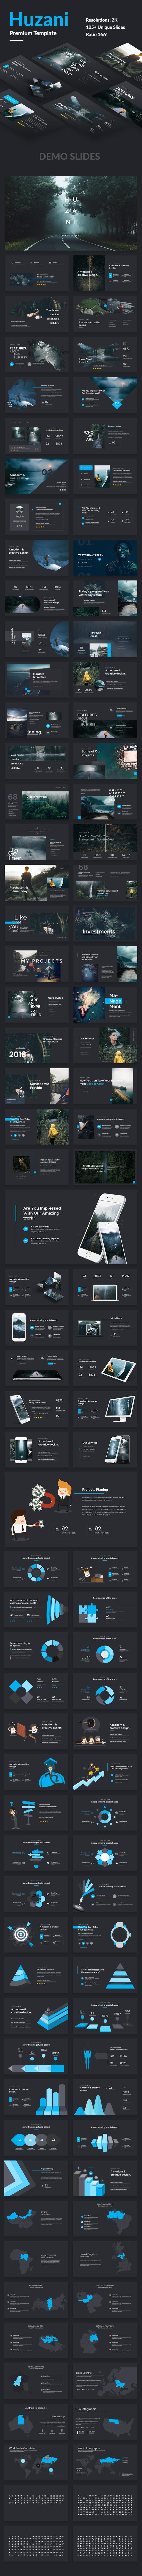 Huzani Premium Design Powerpoint Template - Creative PowerPoint Templates